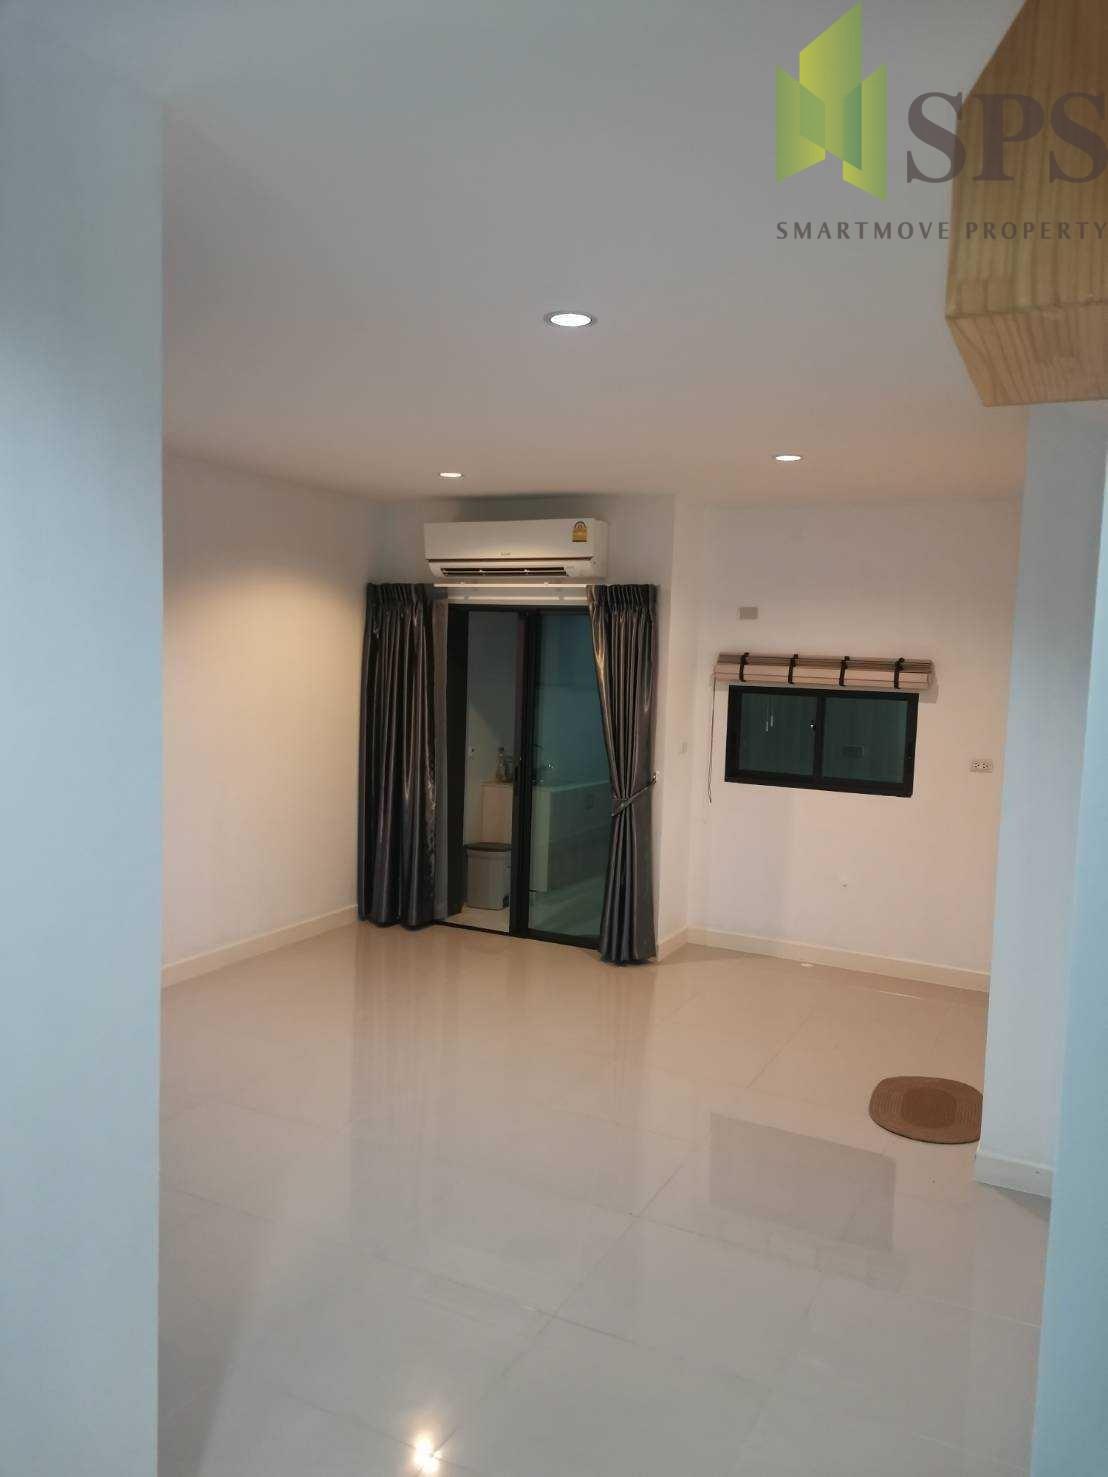 Townhouse Pleno Bangna Km7 พลีโน่ กม7 (SPS-GH1061)